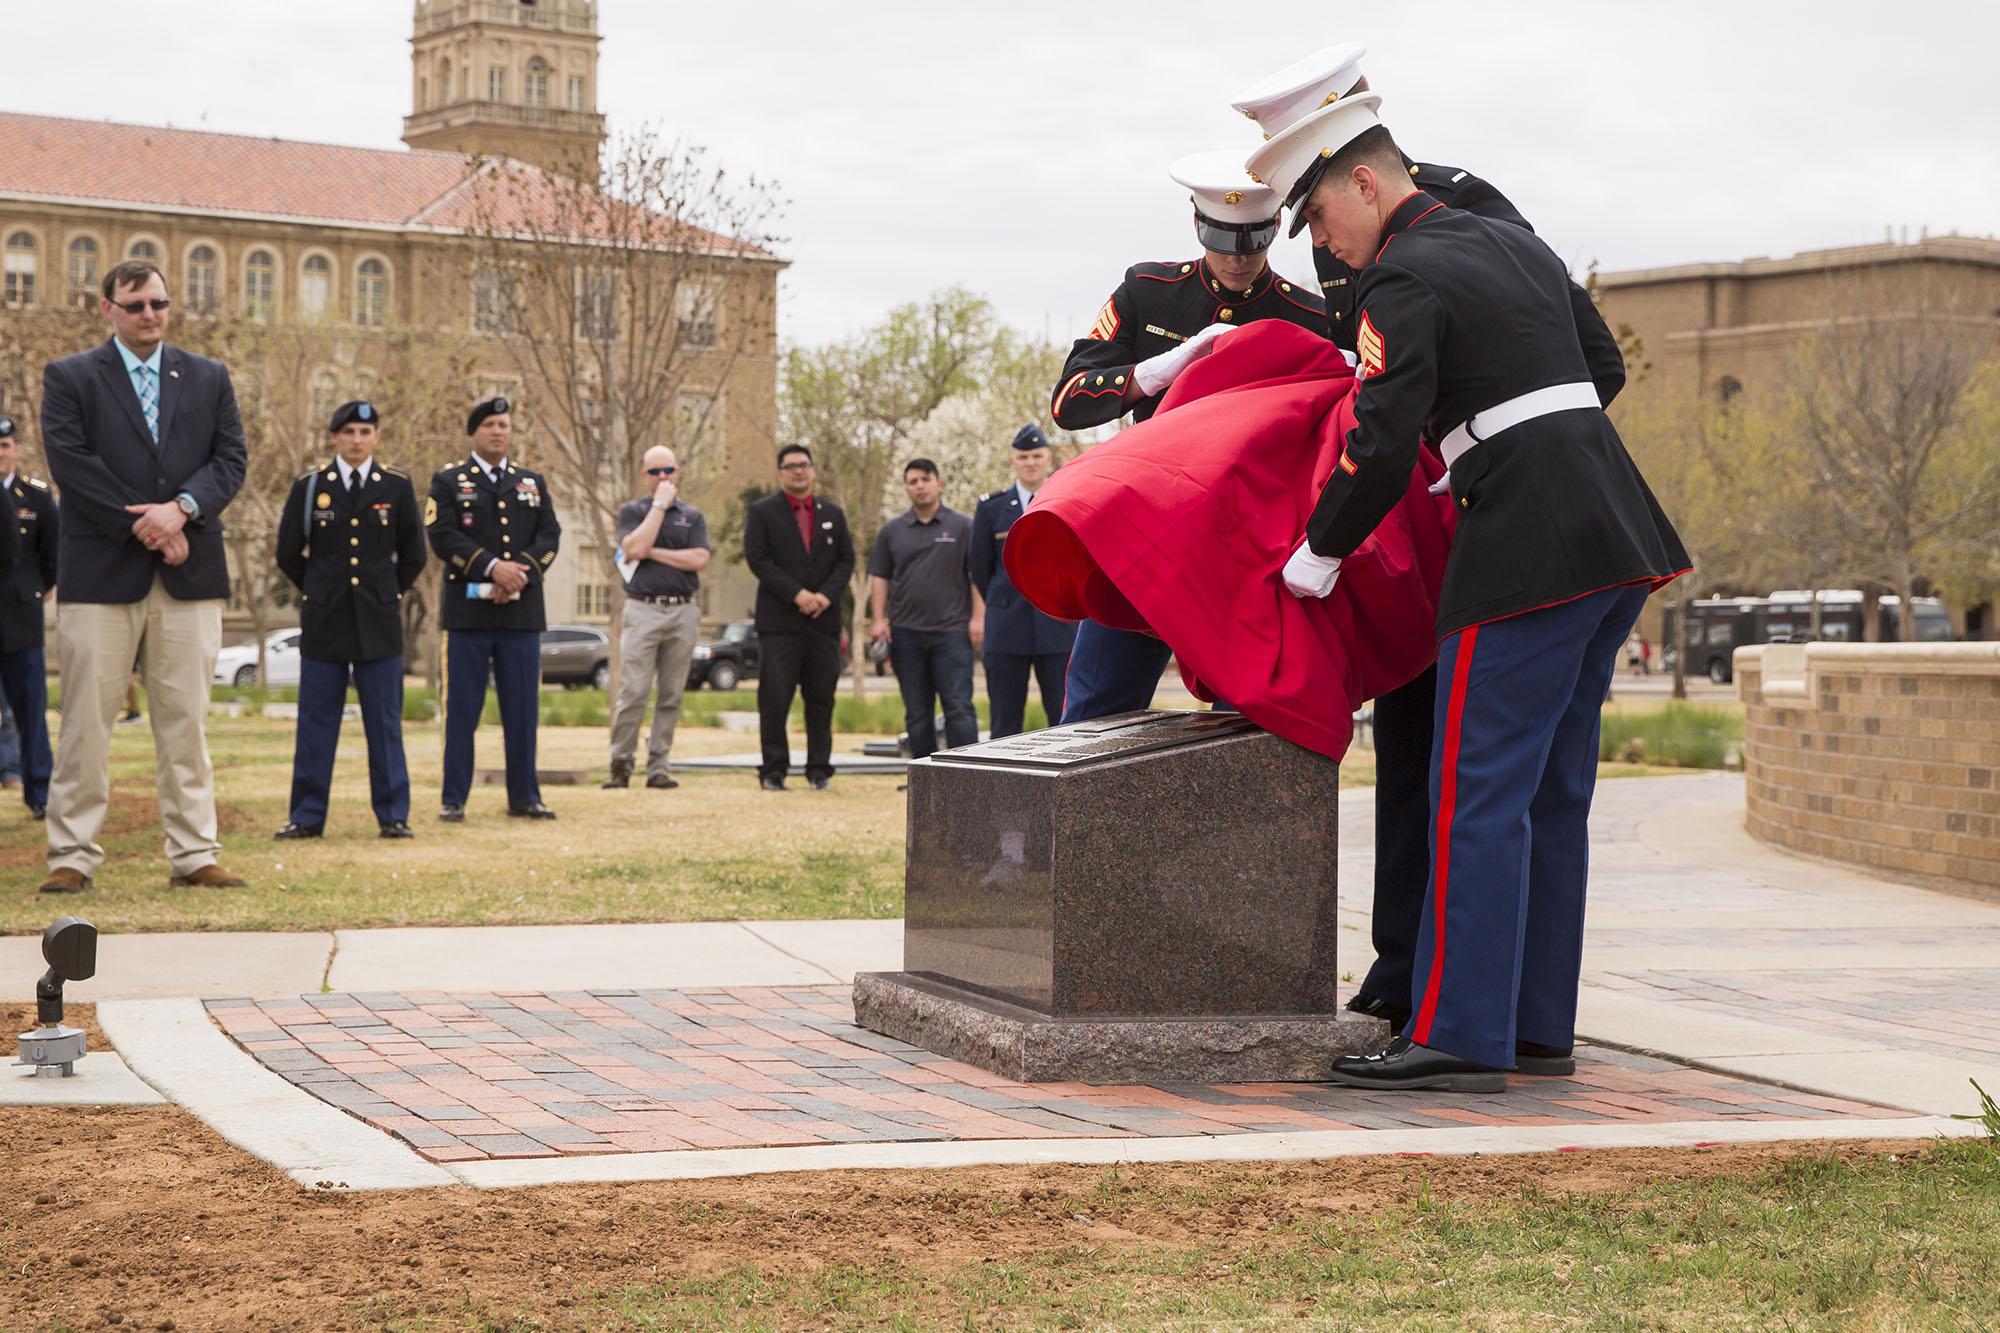 Texas Tech Hosts Medal of Honor Memorial Dedication Ceremony